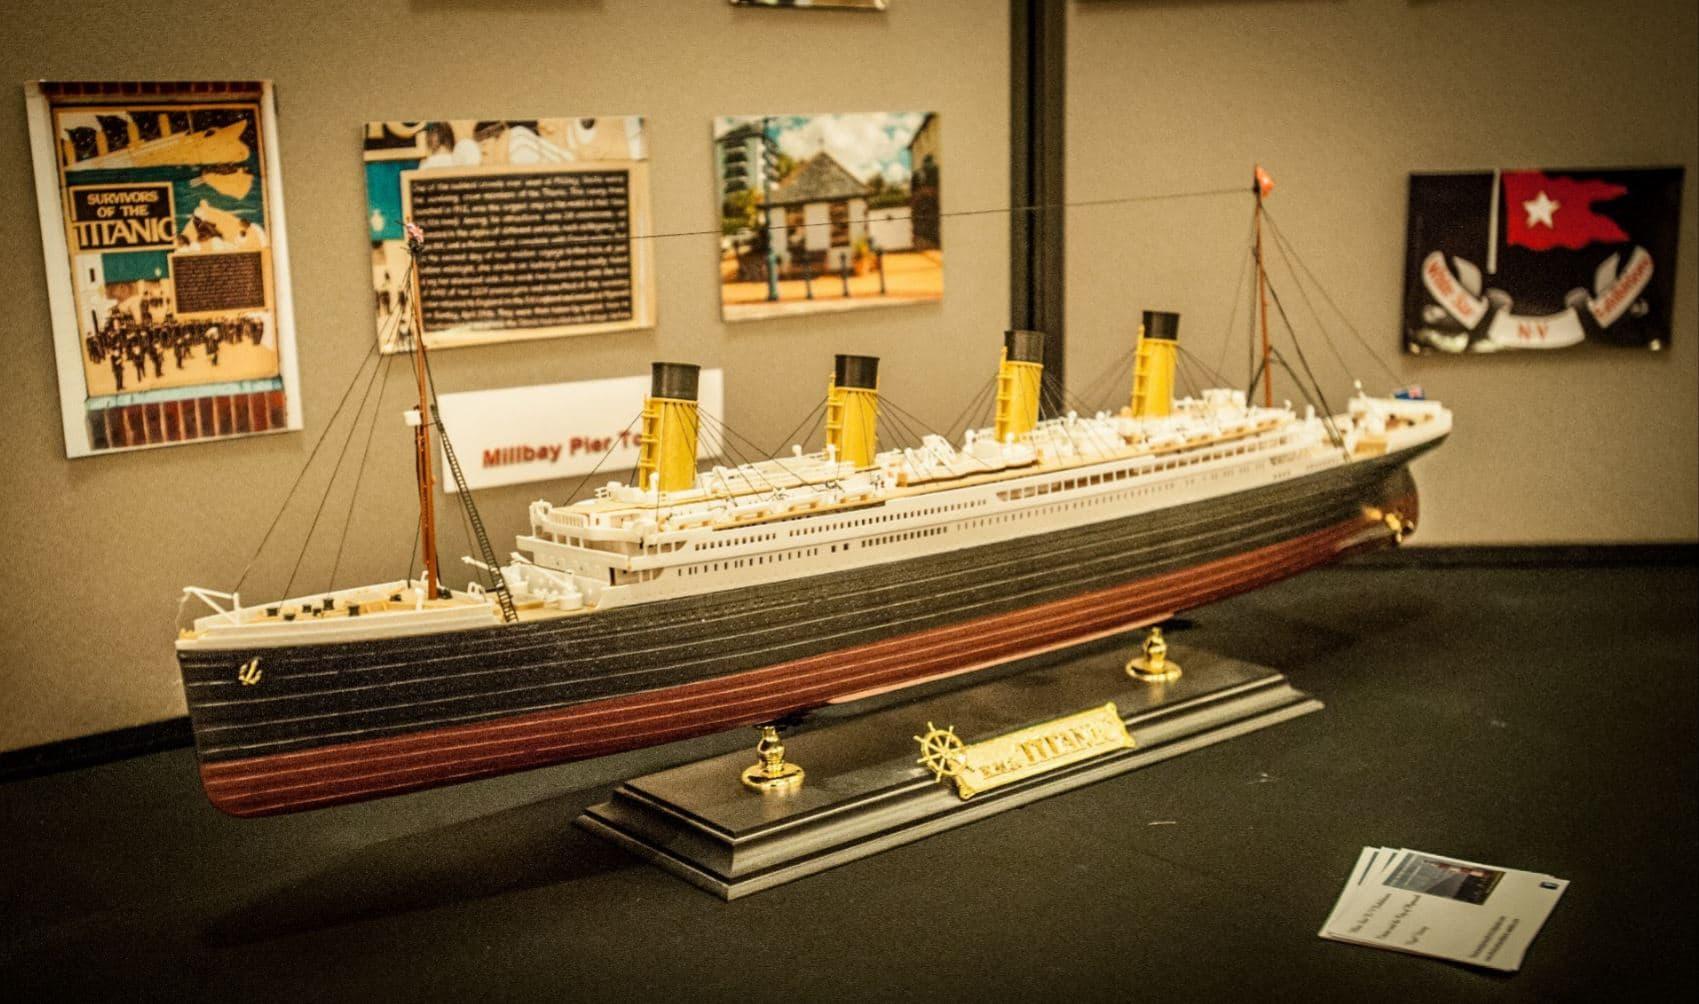 Titanic Exhibition at The Duke  The Duke of Cornwall